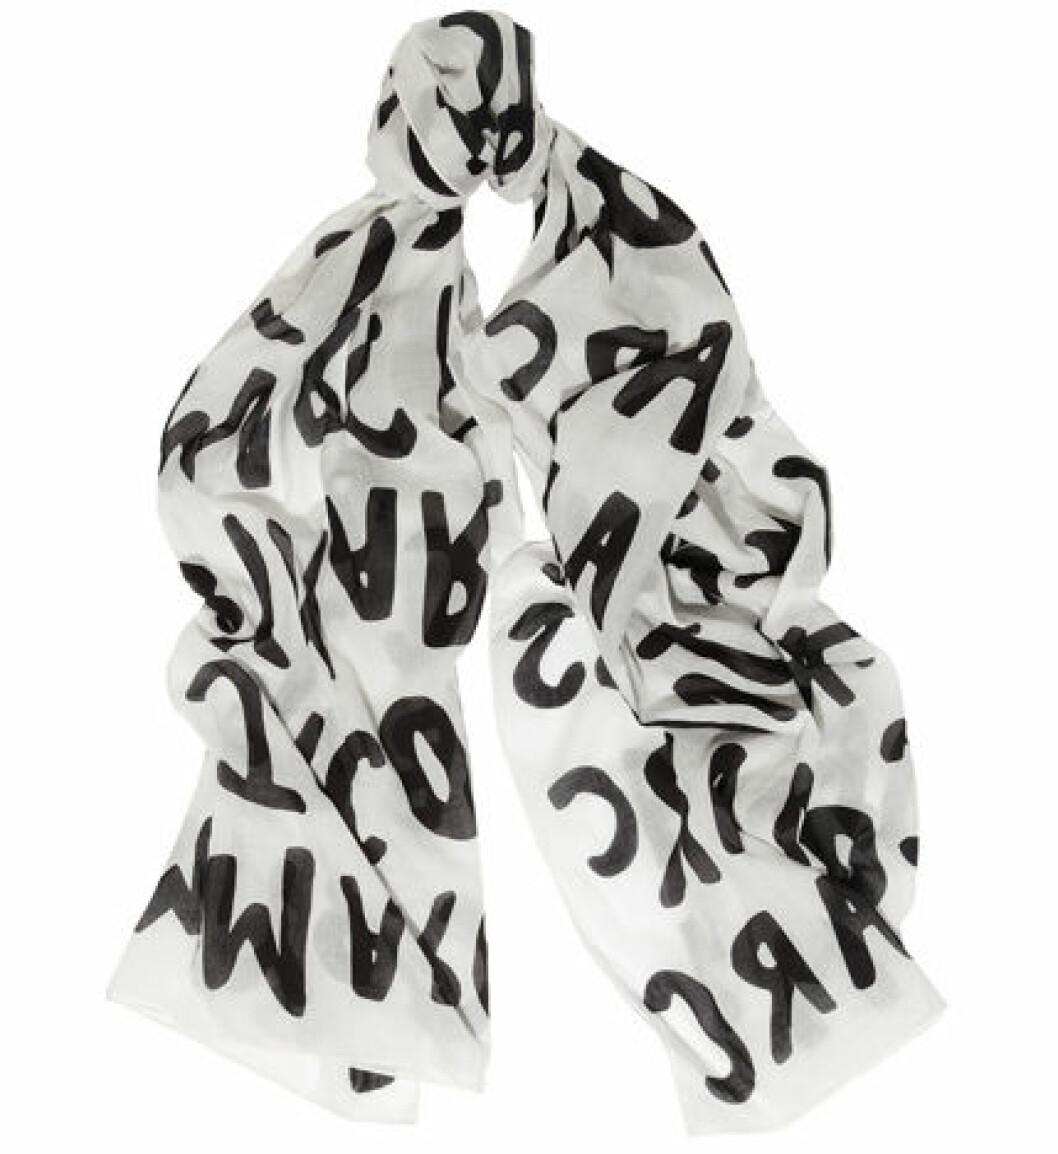 3. Scarf, 977 kr, Marc by Marc Jacobs Net-a-porter.com